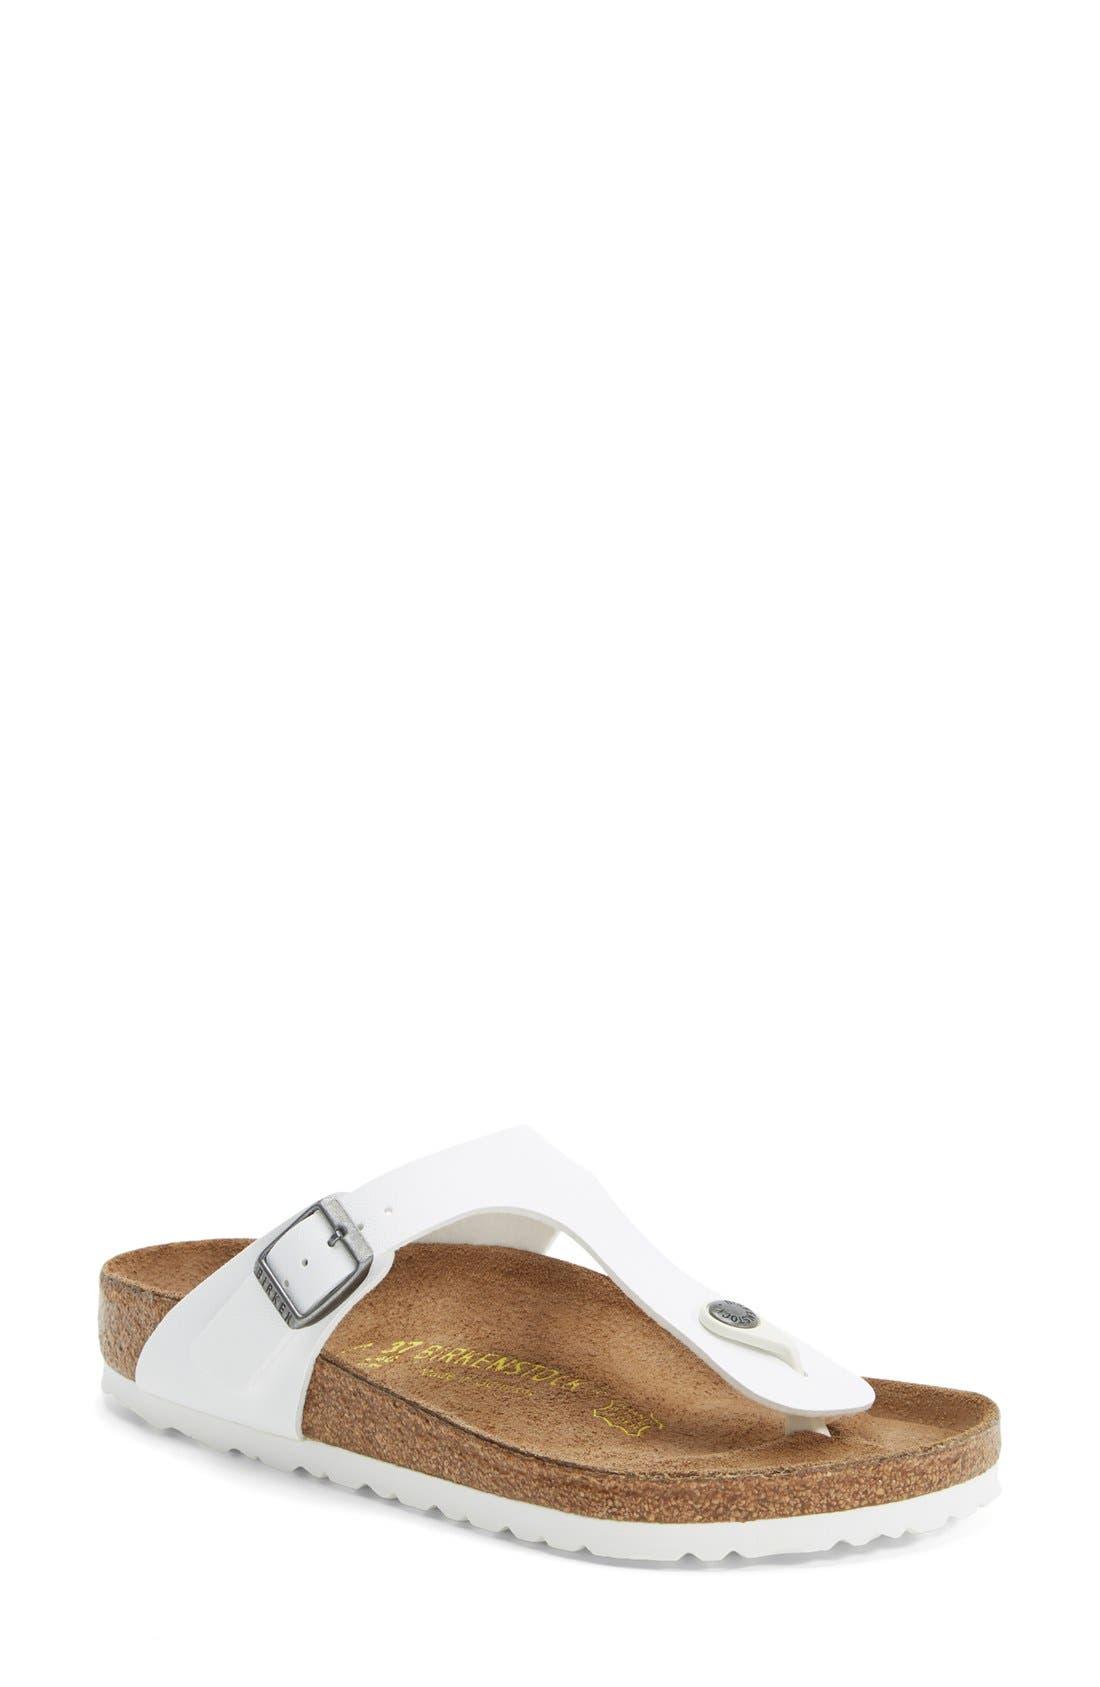 'Gizeh' Birko-Flor Thong Sandal,                         Main,                         color, White